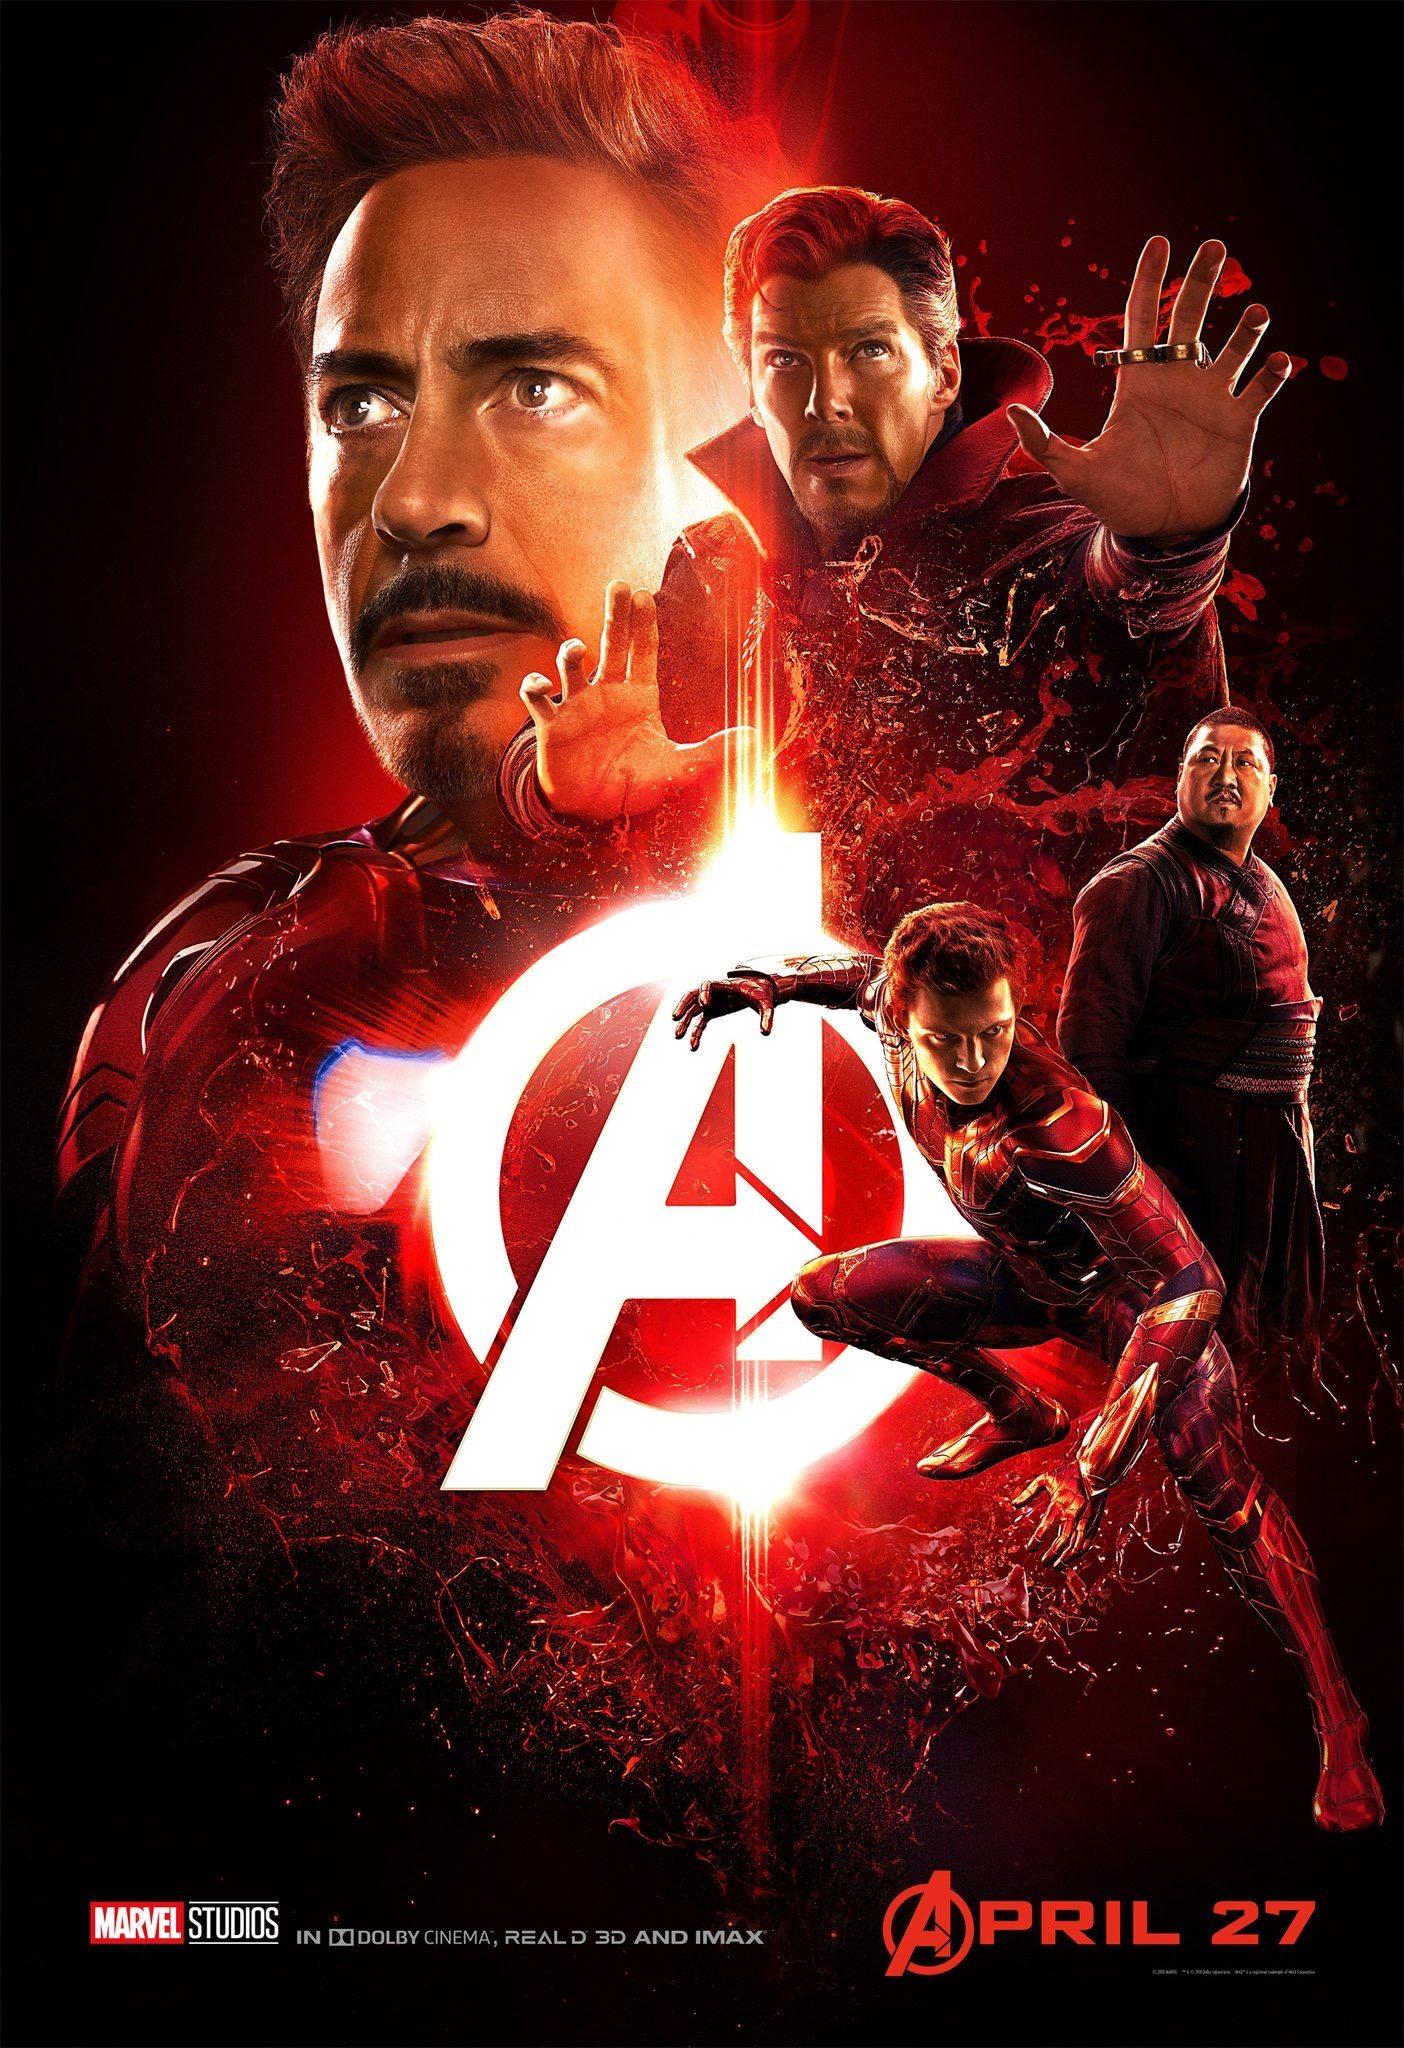 Marvel Veroffentlicht Funf Infinity War Poster Marvel News De